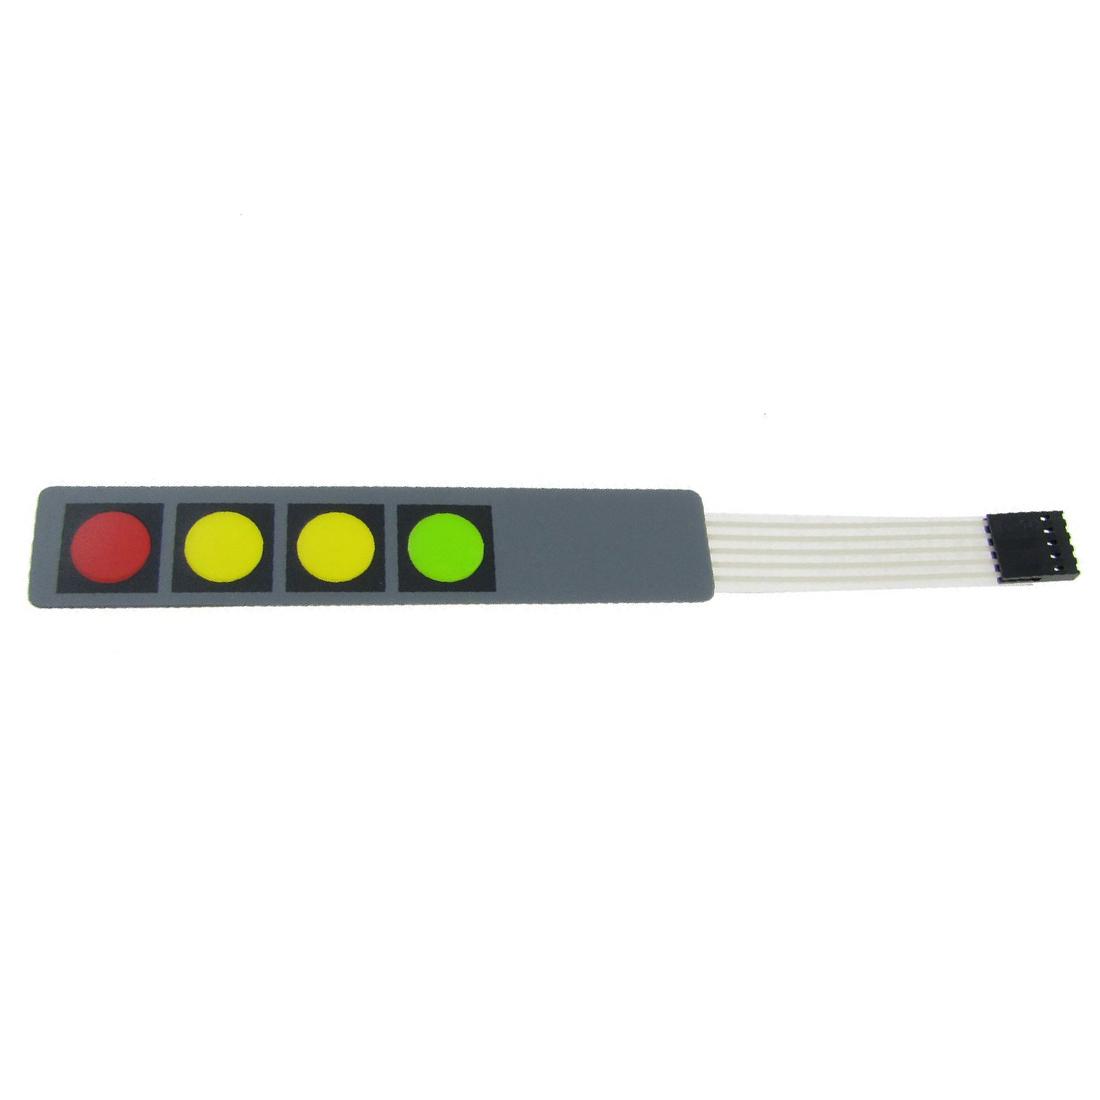 12V-1x4-4-Key-Matrix-MembraneSwitch-Keypad-Keyboard107x20x08mm.jpg